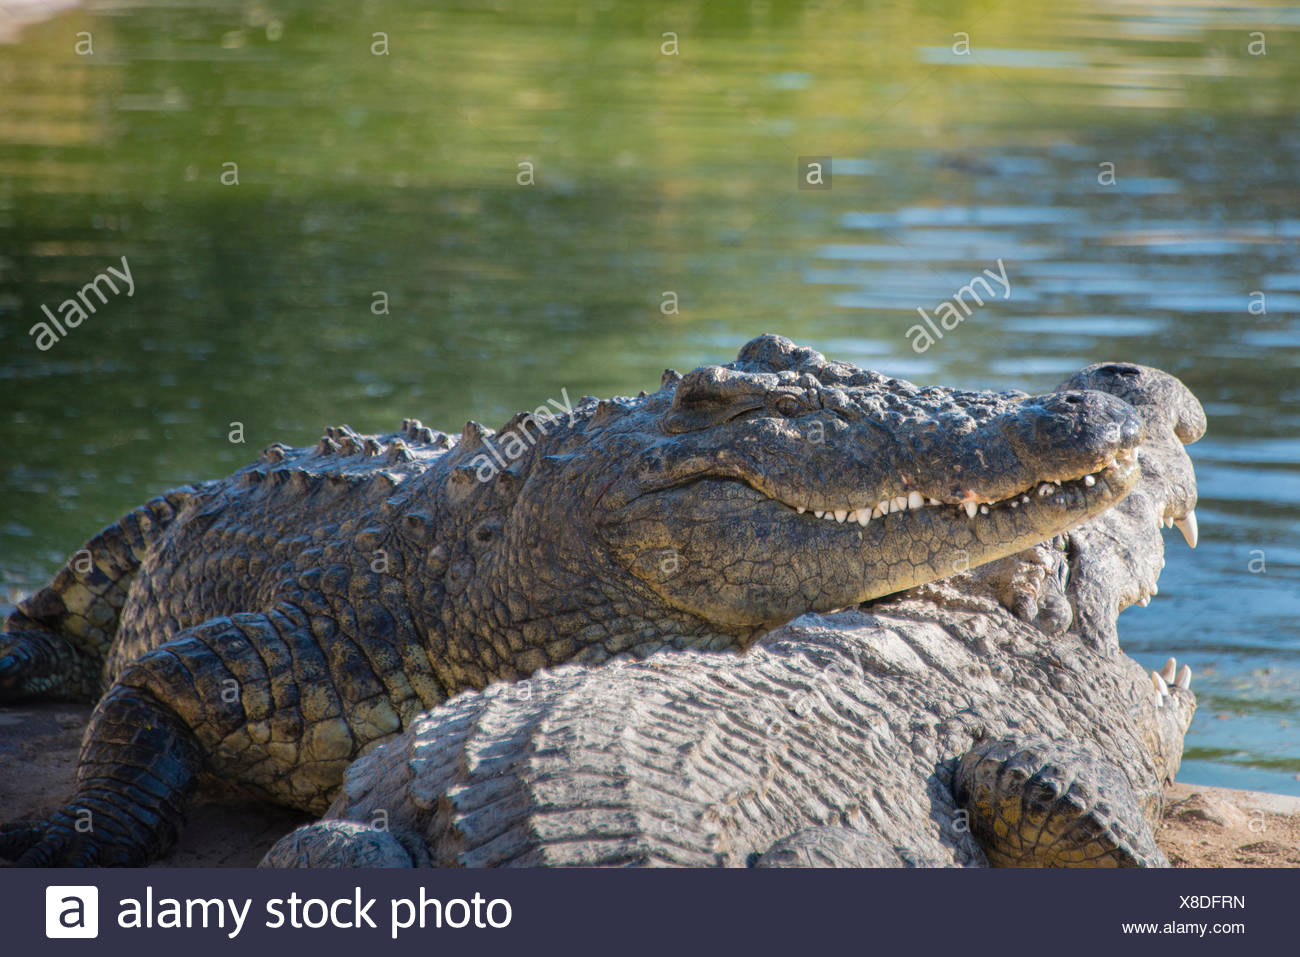 Nile Crocodiles (Crocodylus niloticus), crocodile farm, Otjiwarongo, Namibia - Stock Image